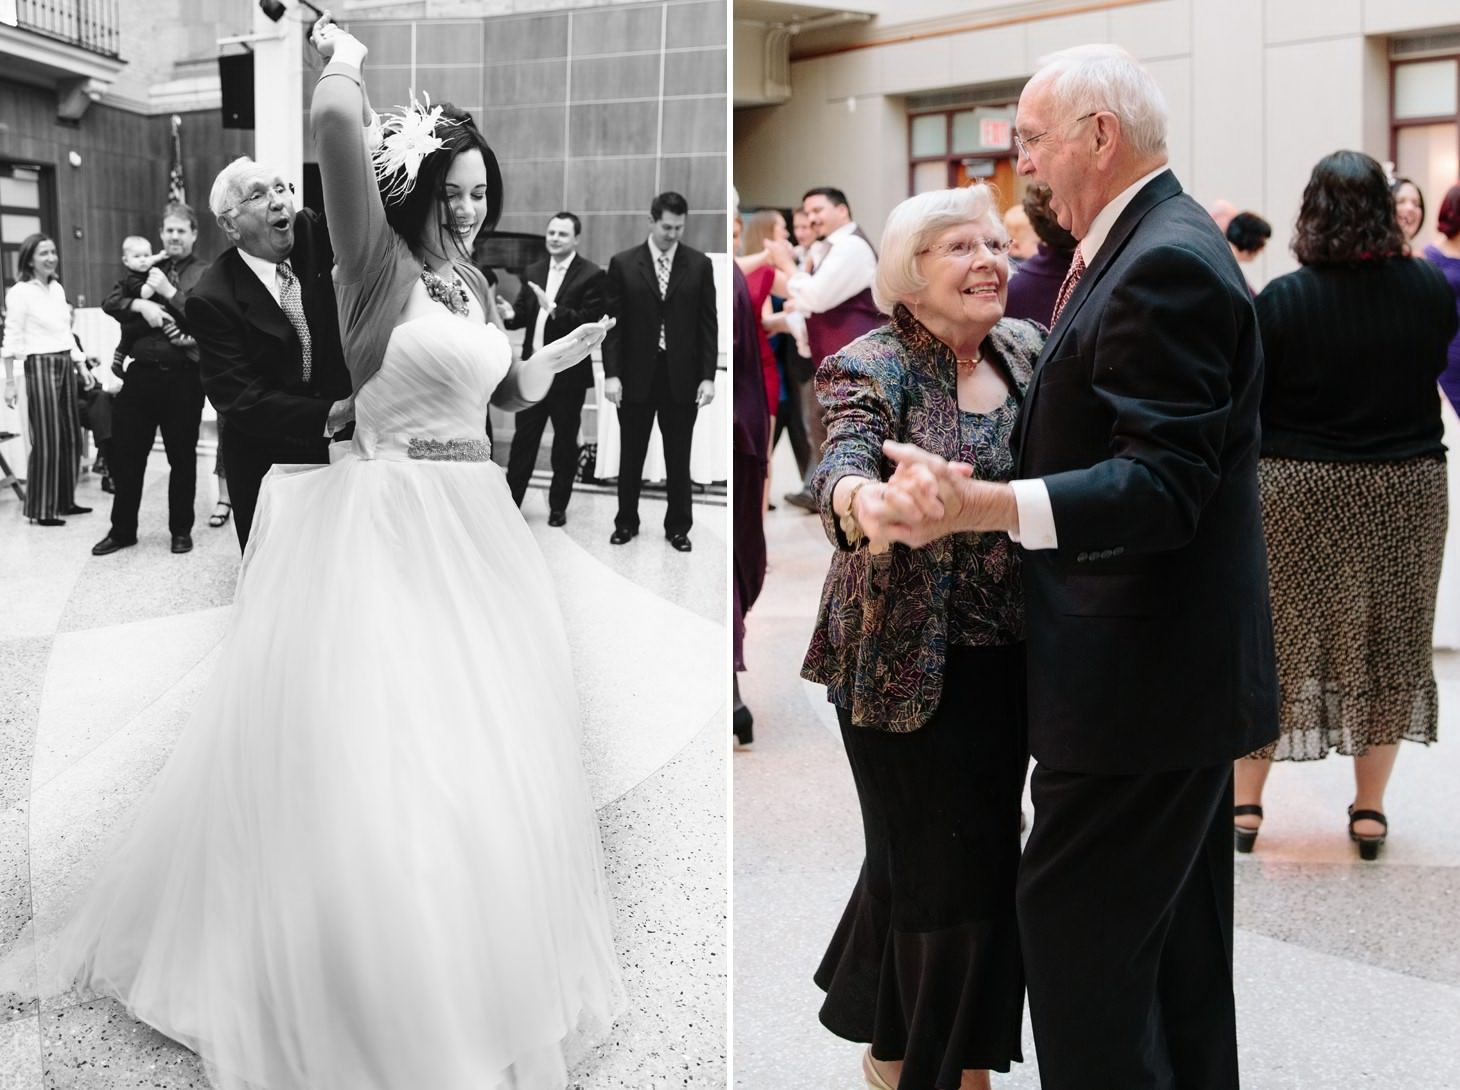 064-nyc-wedding-photographer-smitten-chickens-nj-montclair-art-museum.jpg